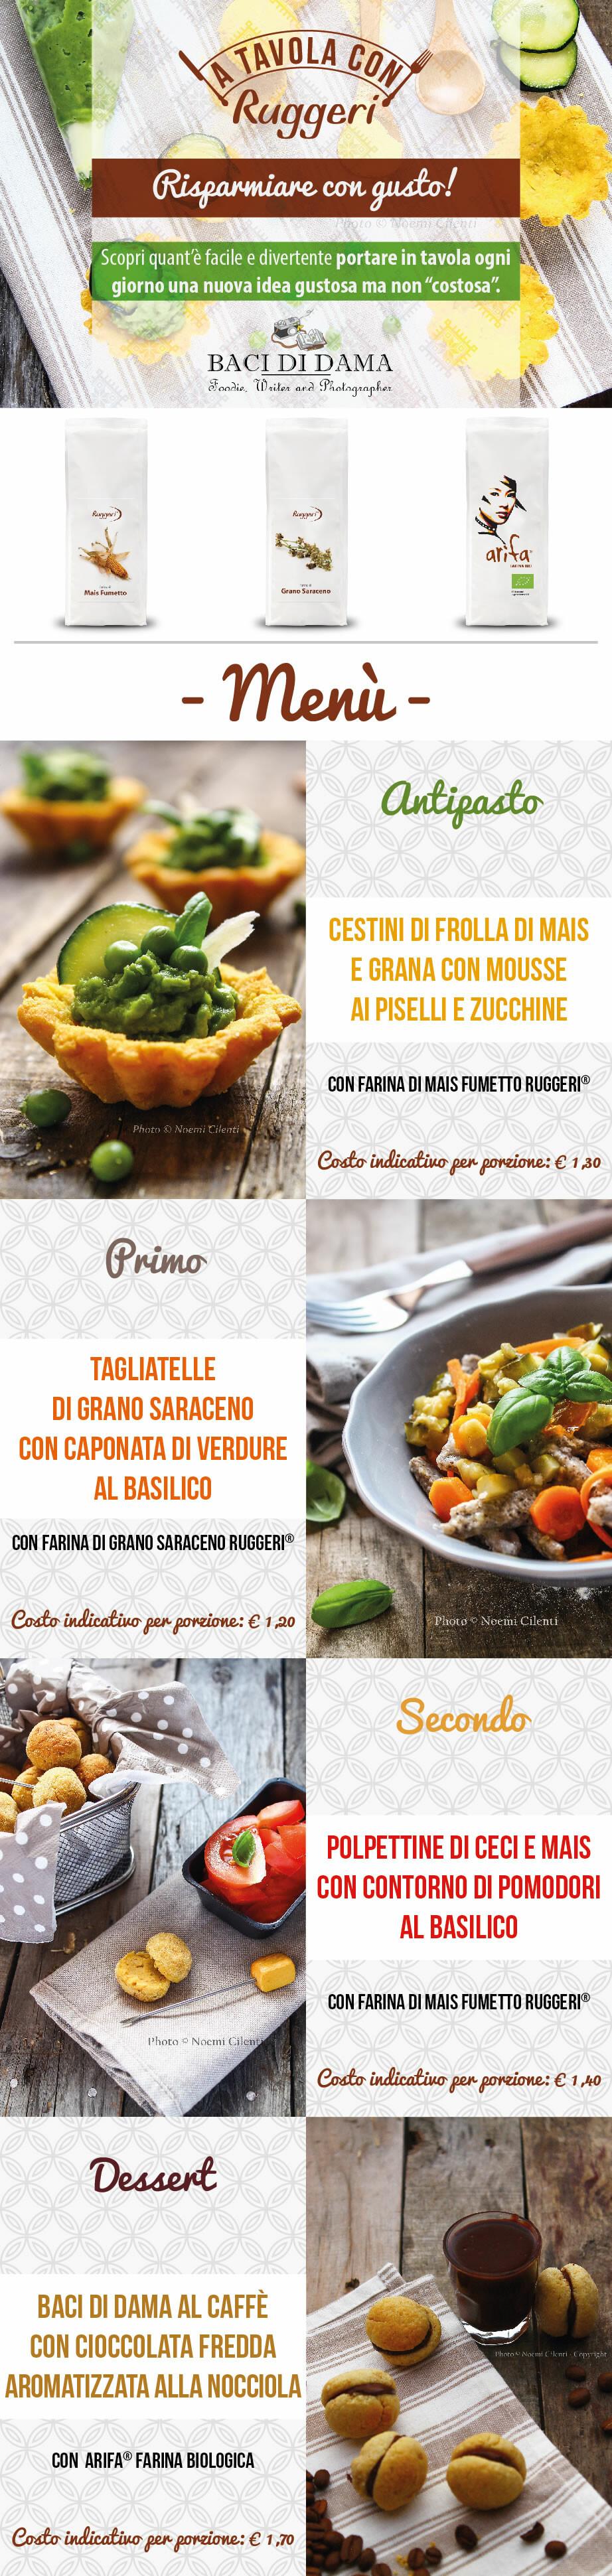 020_a_tavola_con_ruggeri_menu